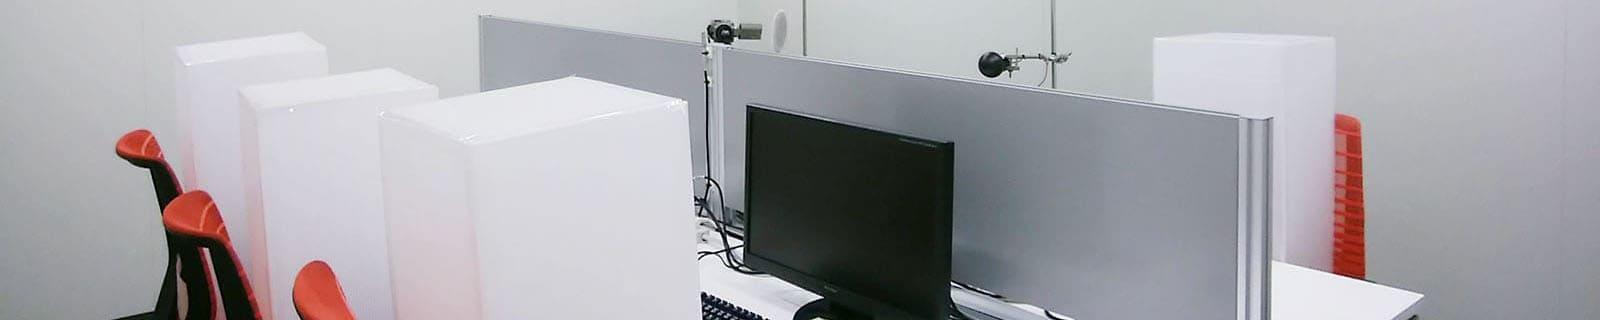 ZEB空調システム